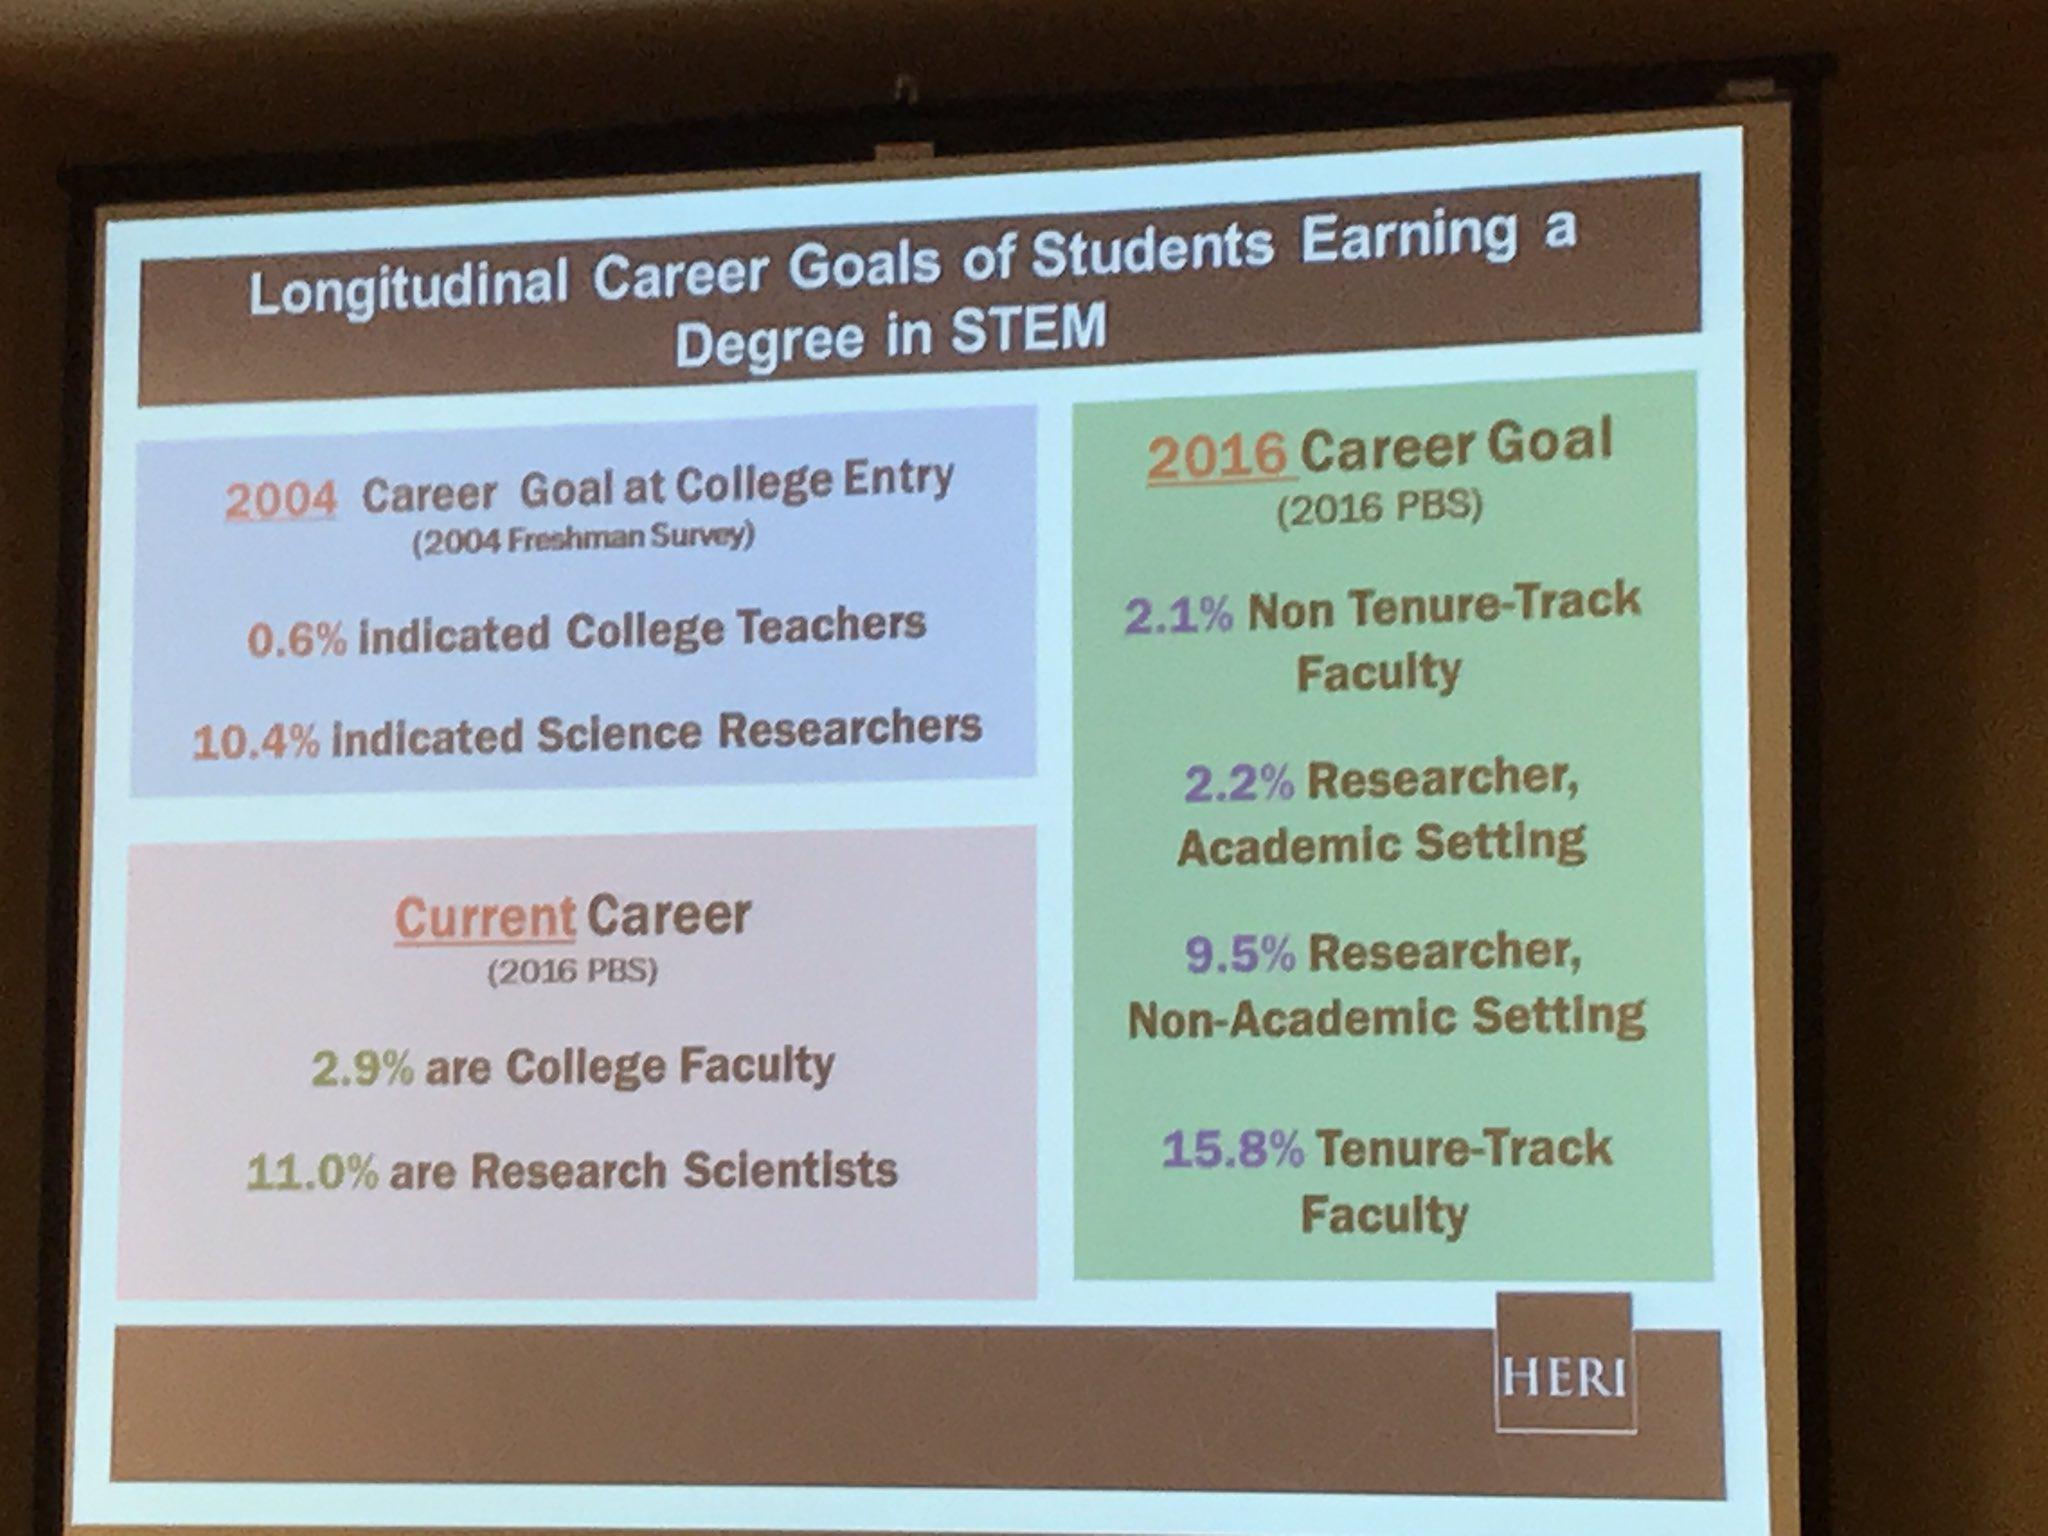 Career goals of students studying #STEM via Dr Sylvia Hurtado @CSIC17 https://t.co/AVbdamFiNN